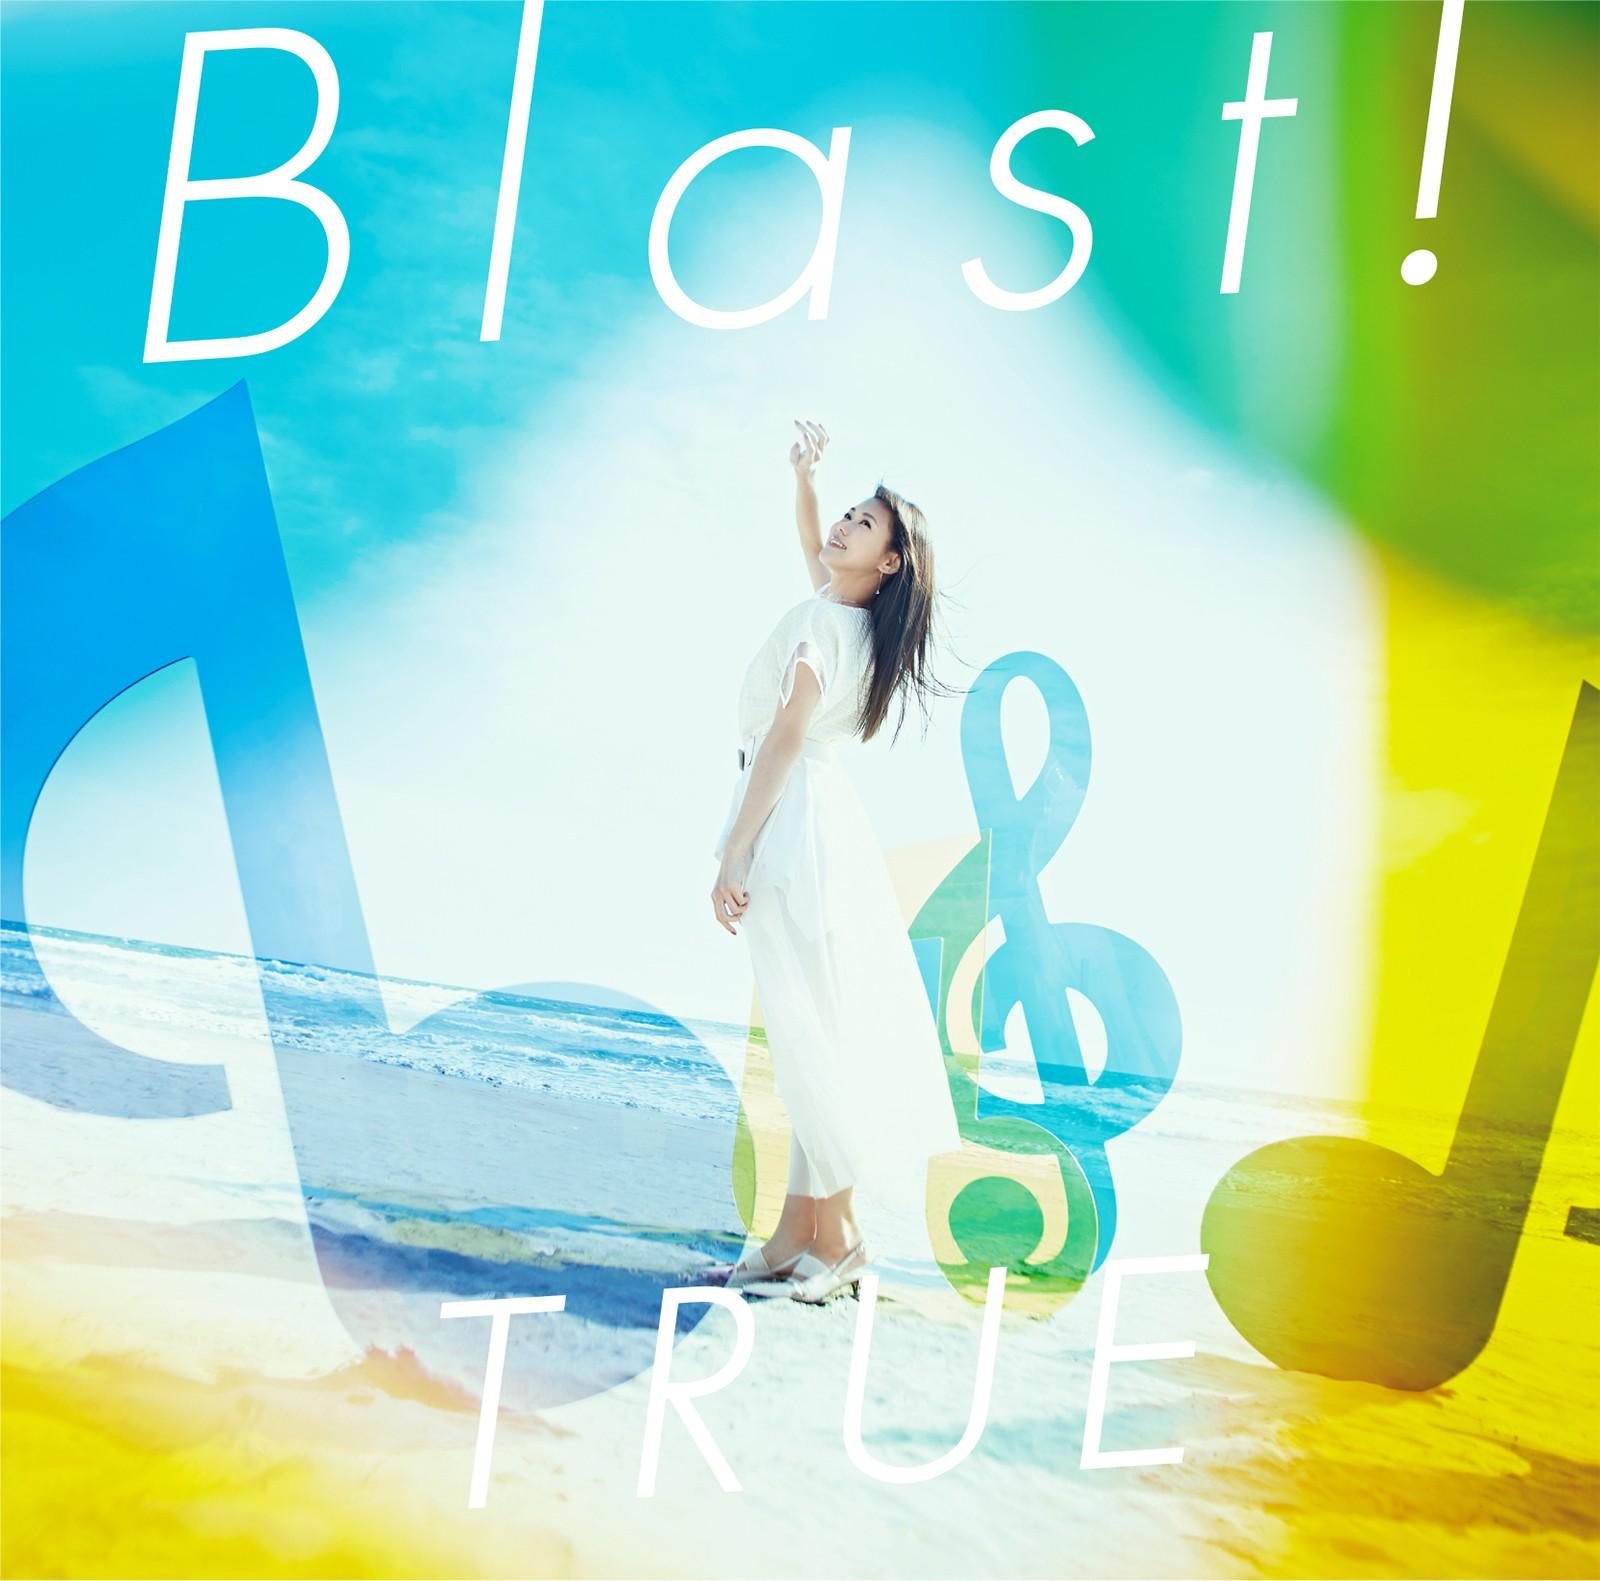 唐沢美帆 (Miho Karasawa) – Blast! [FLAC + MP3 320 / WEB] [2019.04.17]